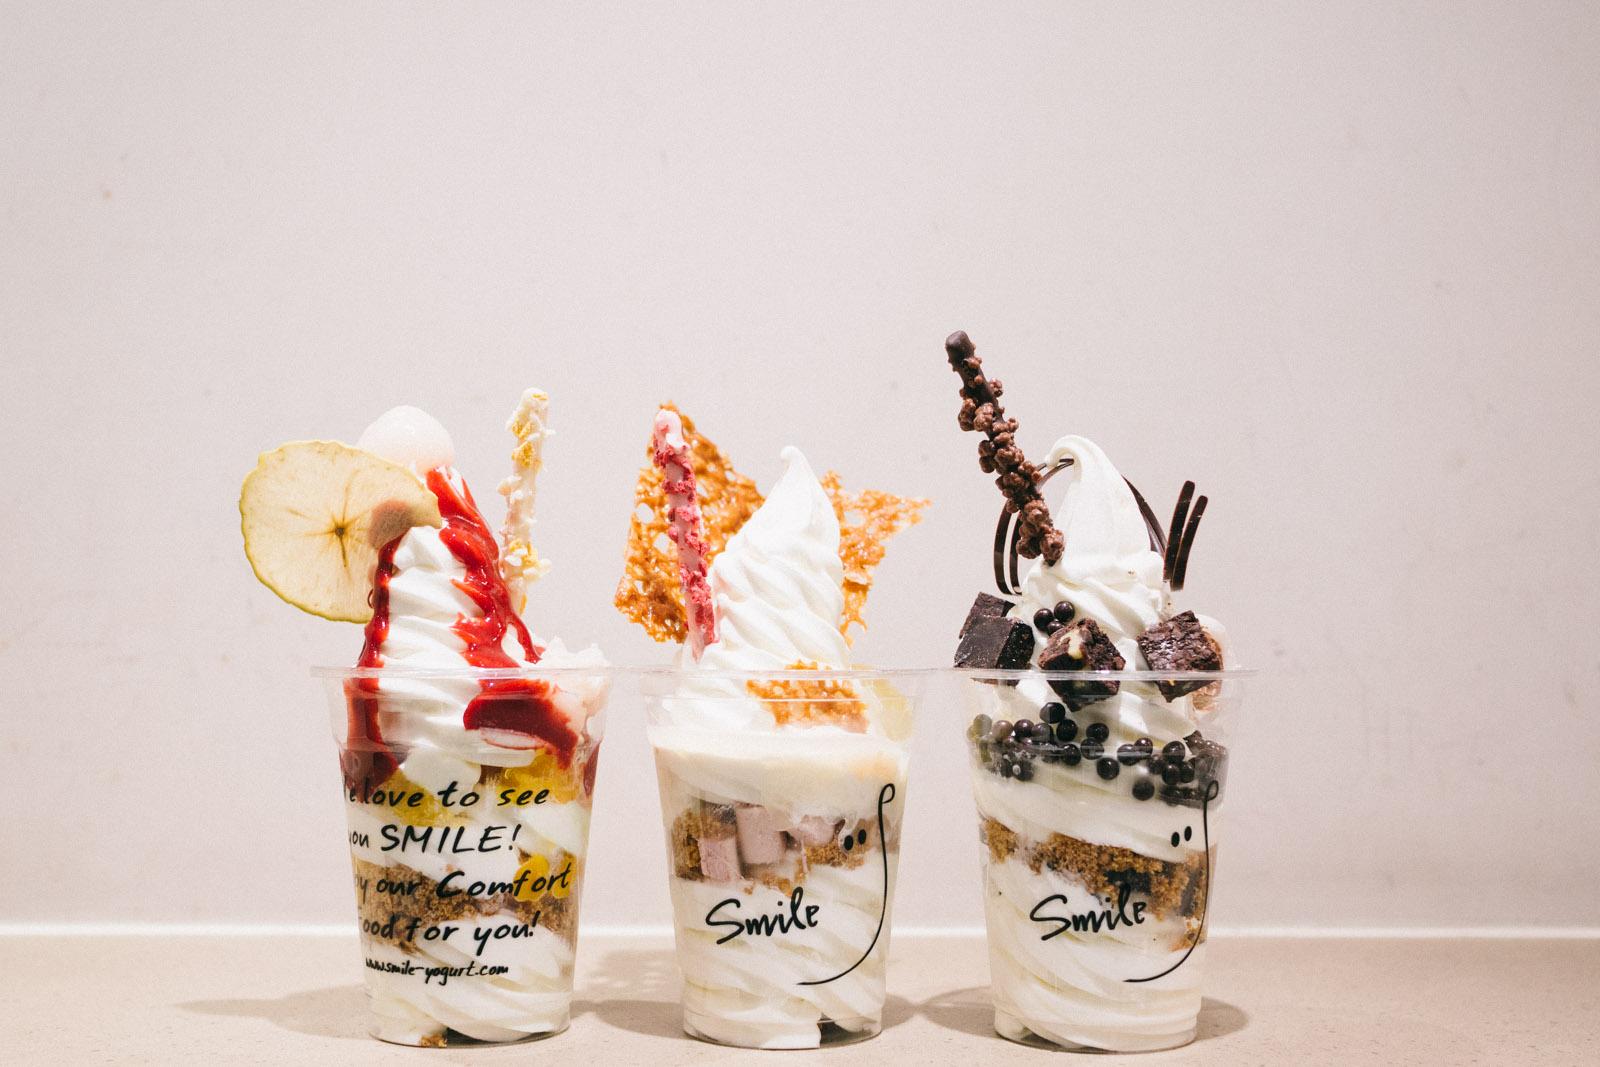 that-food-cray-hong-kong-tony-wong-smile-frozen-yogurt-dessert-bar-9